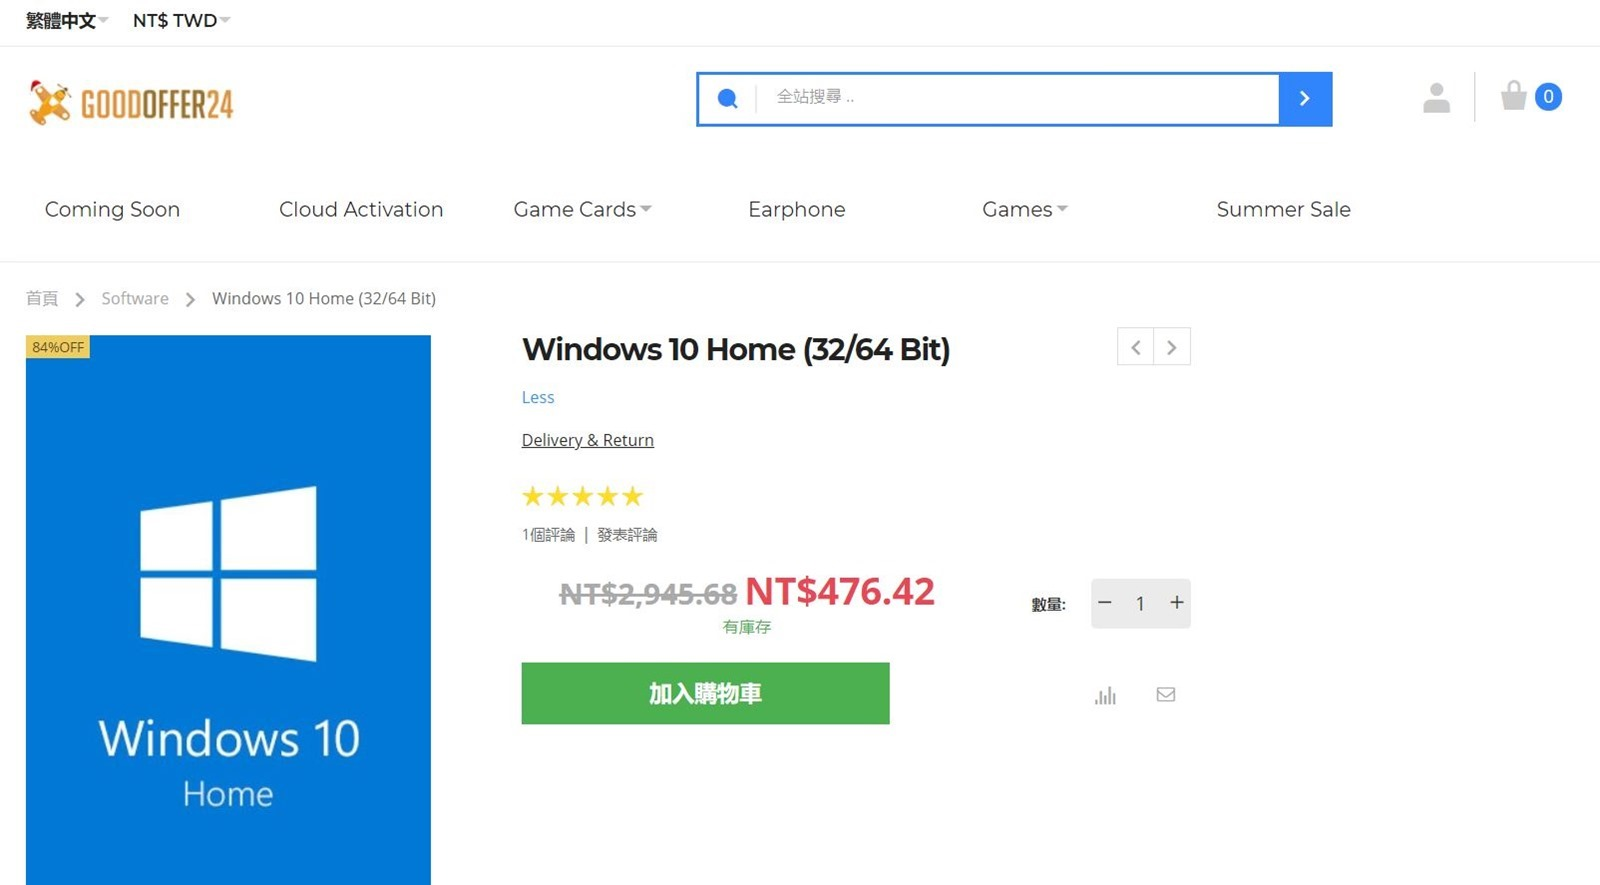 Windows 7 支援終止倒數不用怕!升級 Win10 正是時候!便宜 Windows 10 免註冊、直接購買,優惠代碼都給你! @3C 達人廖阿輝